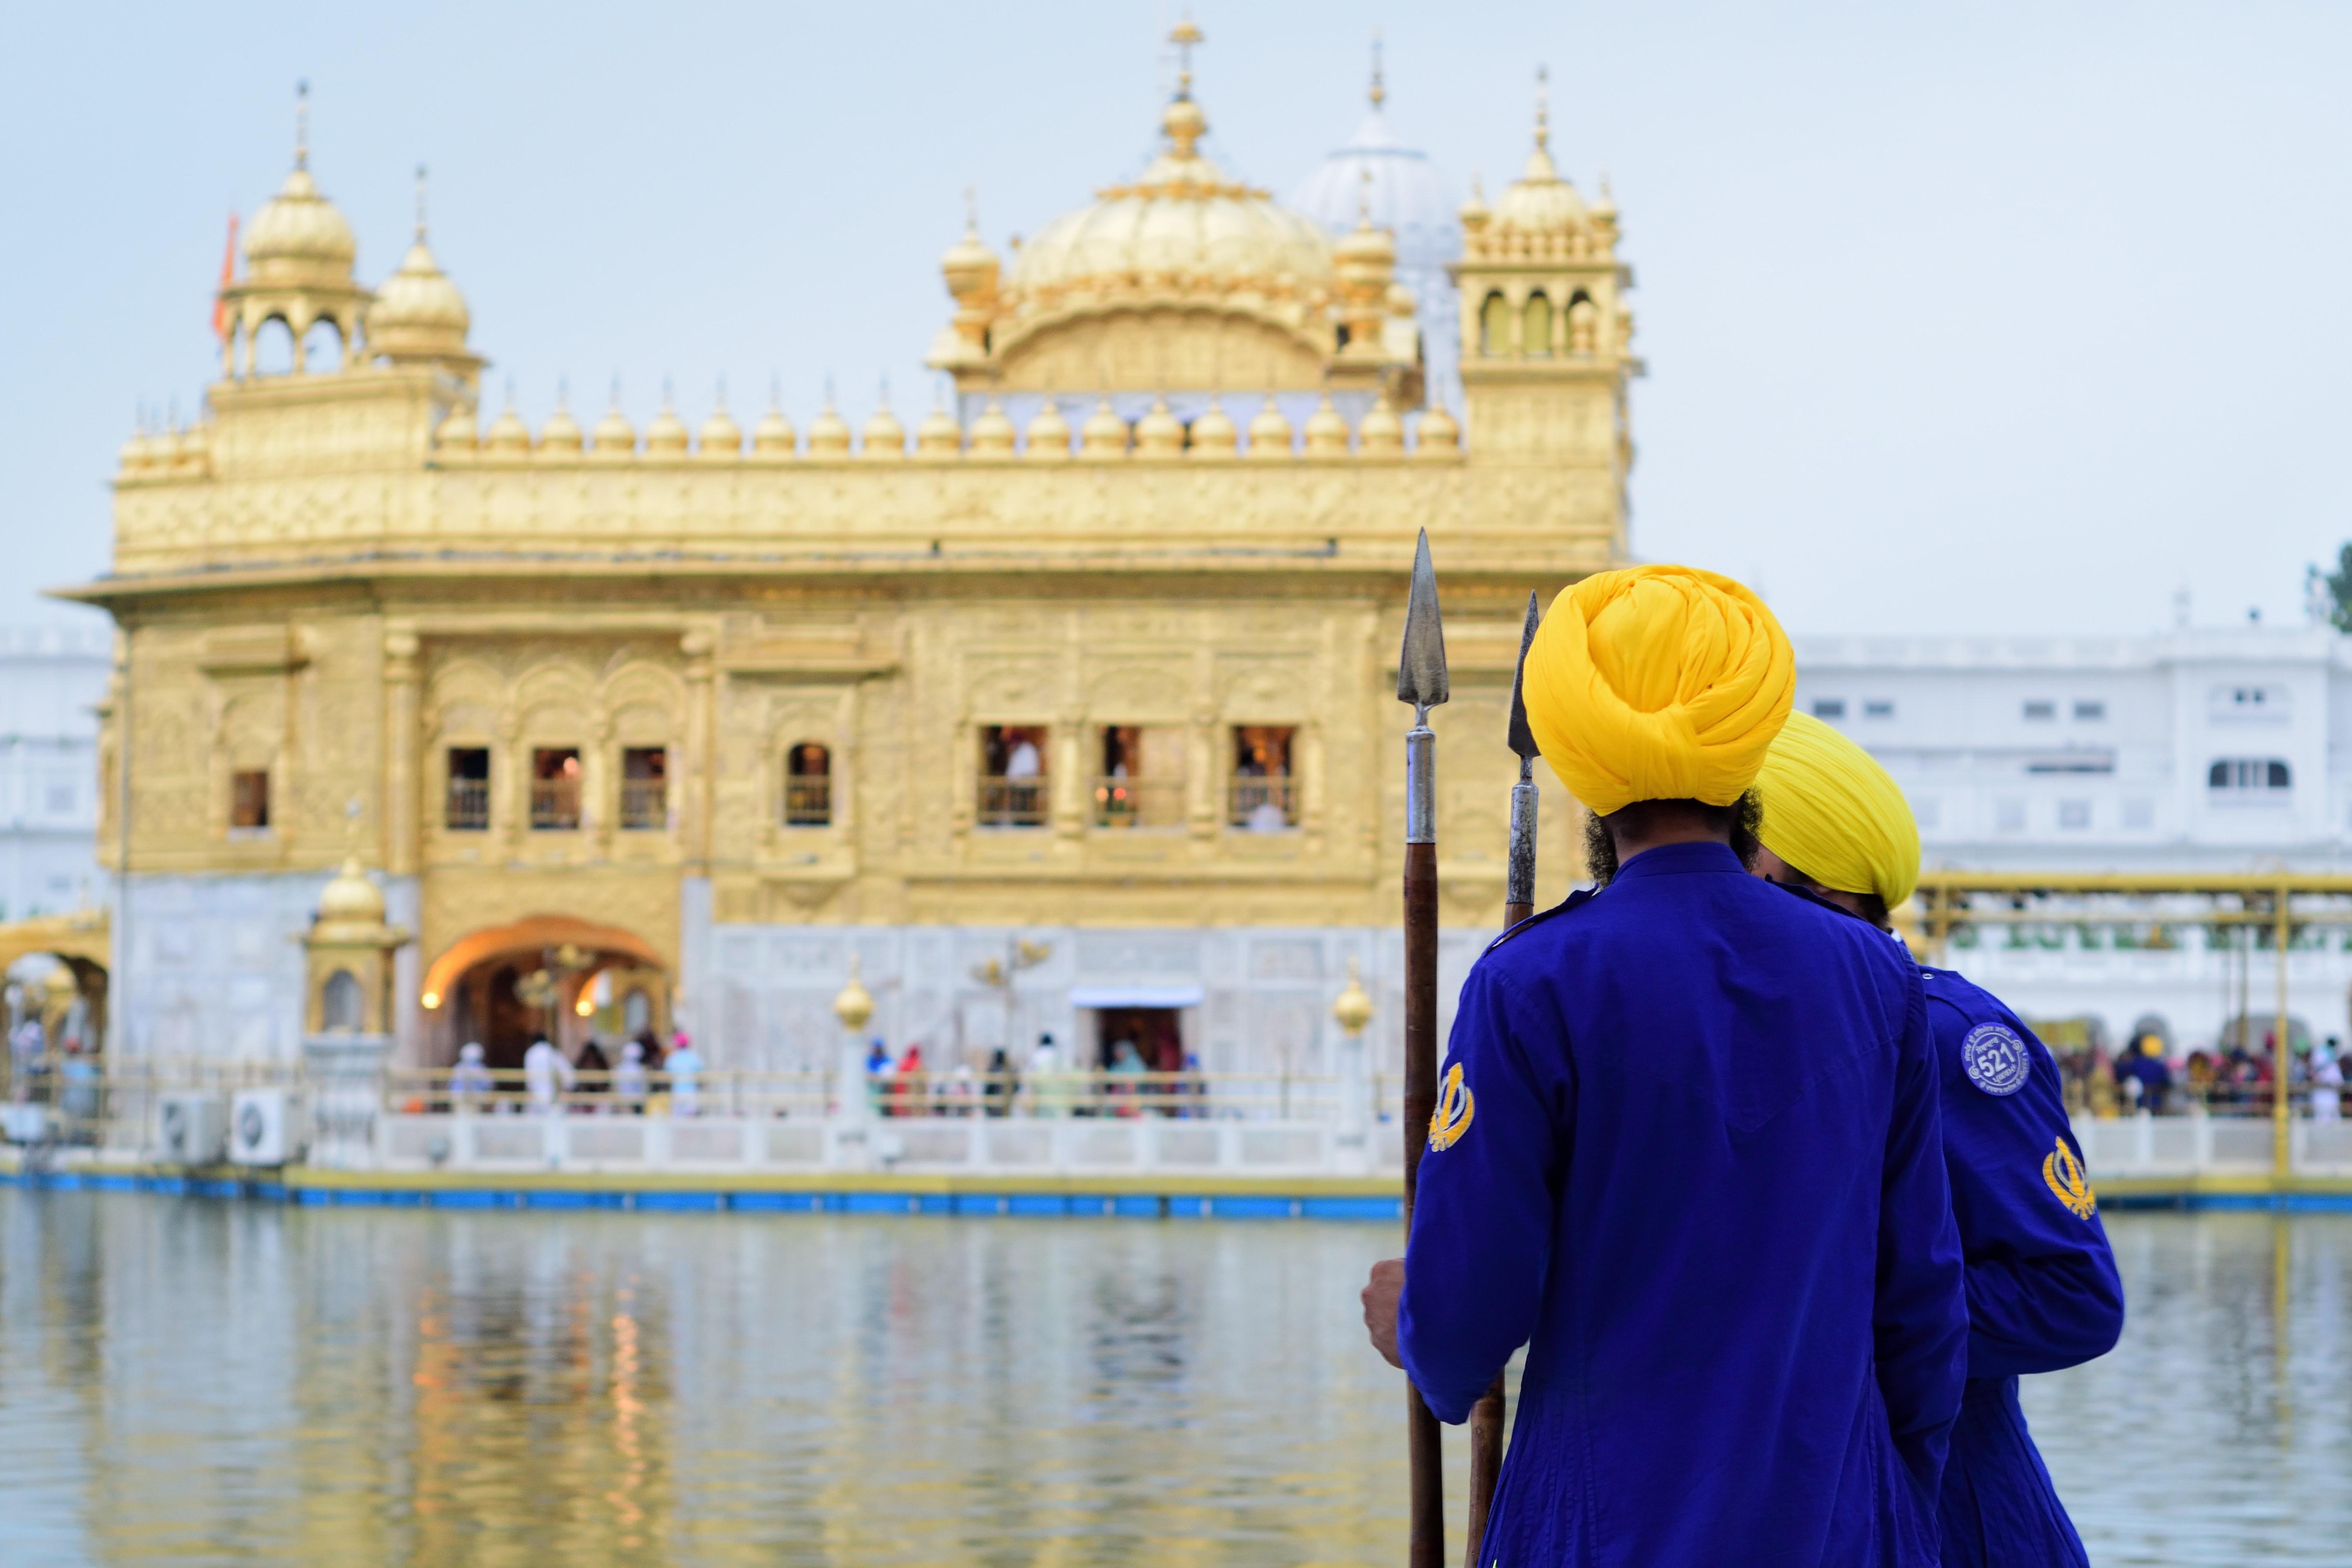 Divine and pure gold, Golden temple, Spiritua;l places in North India